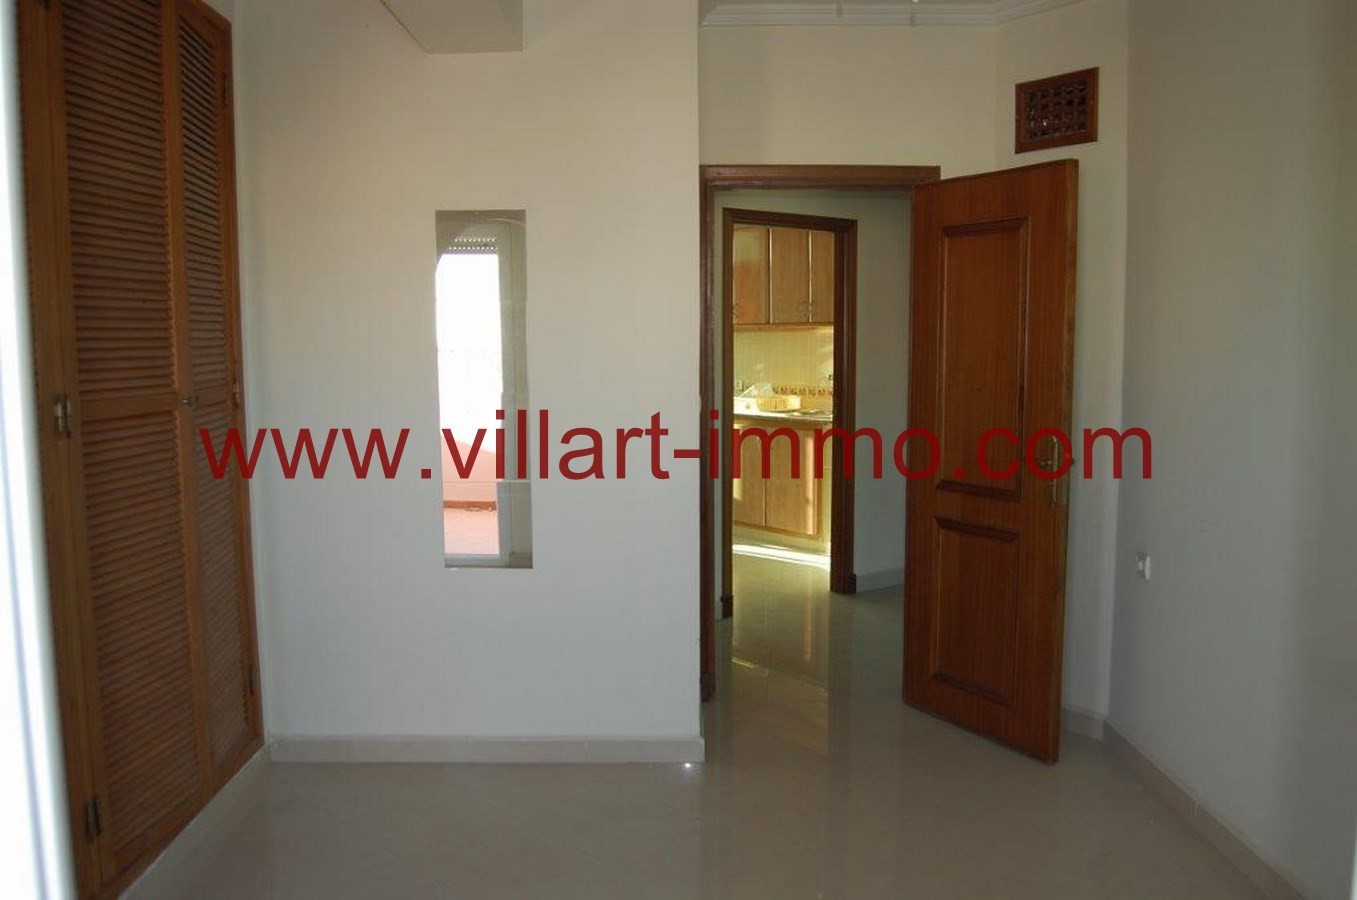 10-Location-Appartement-Non meublé-Tanger-Chambre-L718-Villart immo